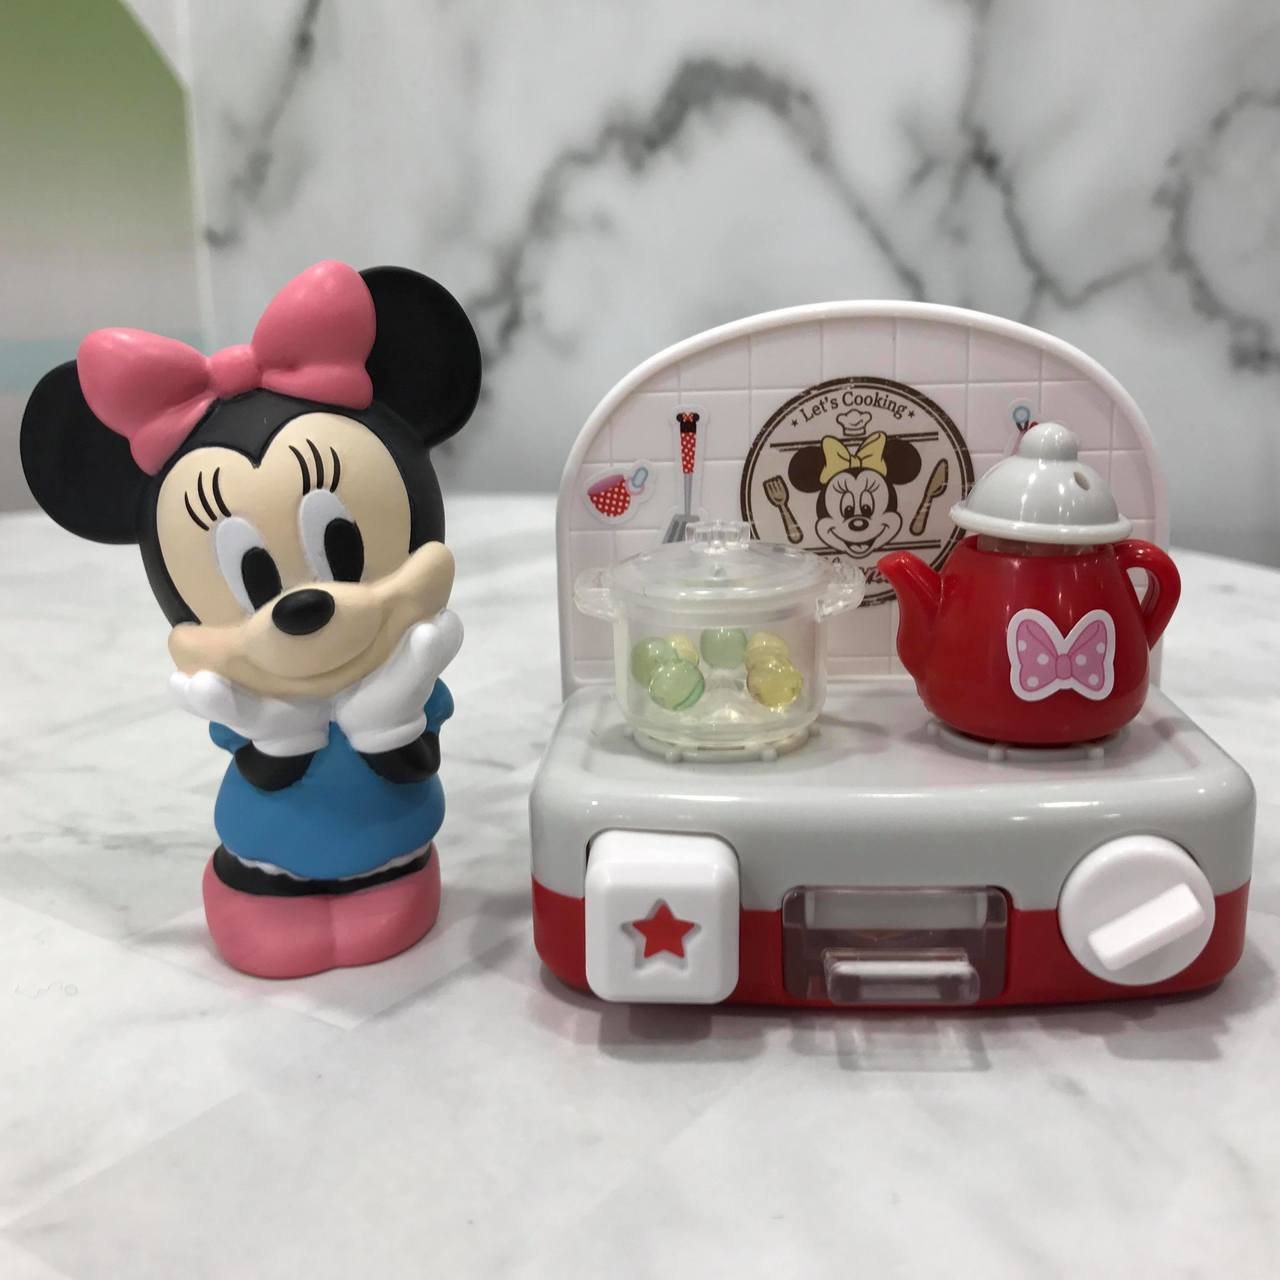 7-ELEVEN獨家限量販售3款「迪士尼與好朋友們小廚房」,售價皆為185元。記...